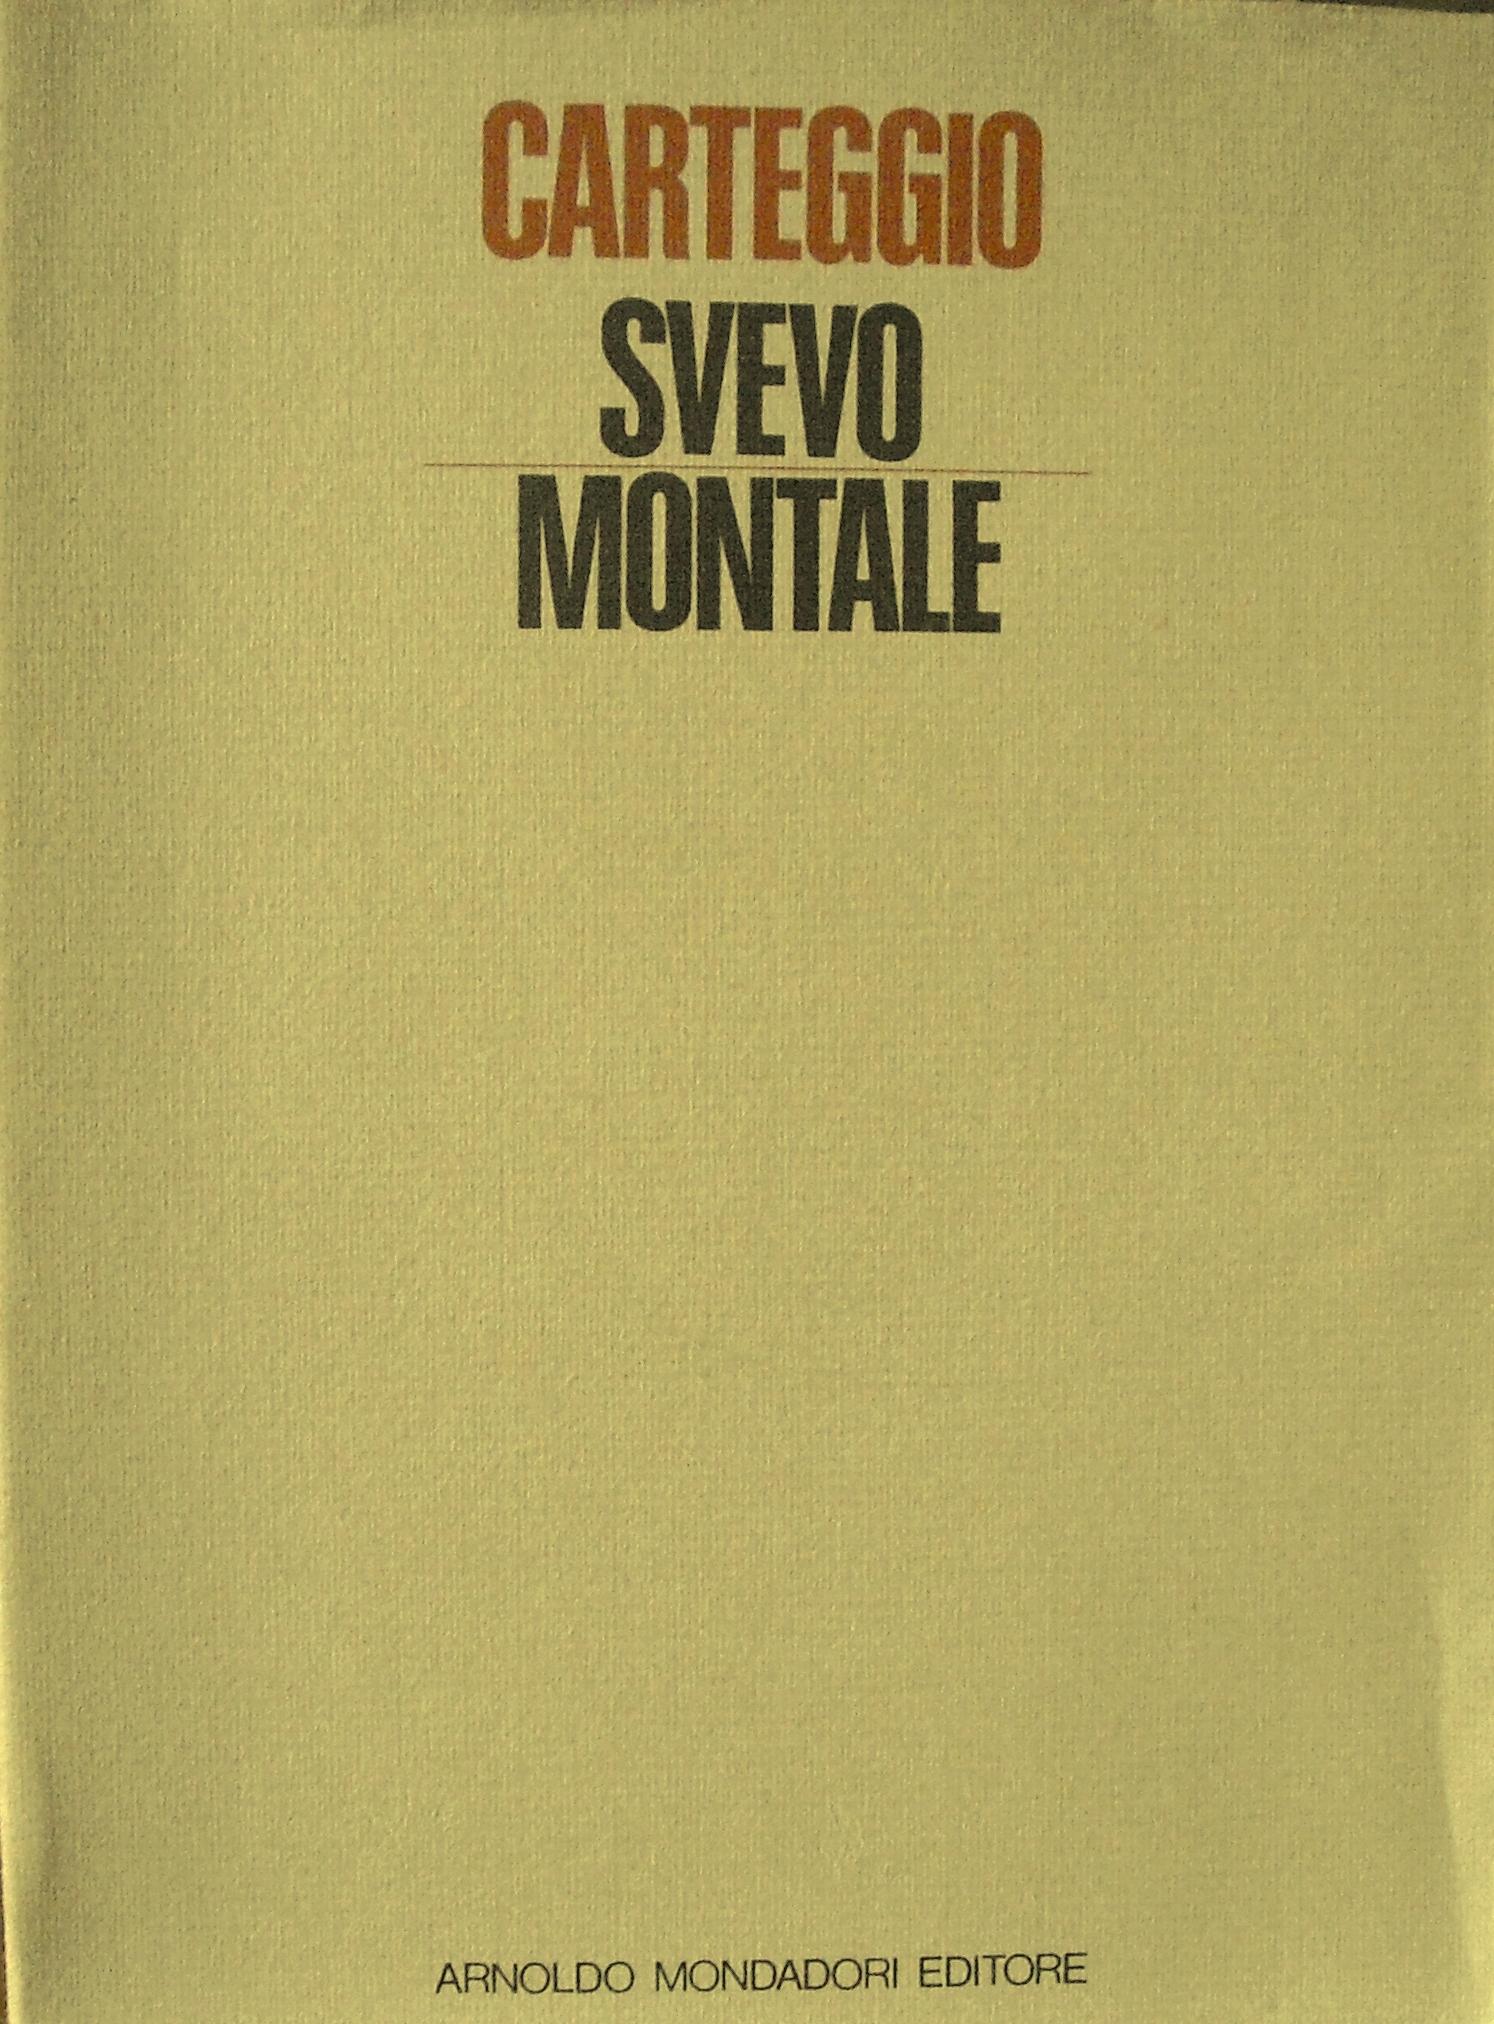 Carteggio Svevo - Montale